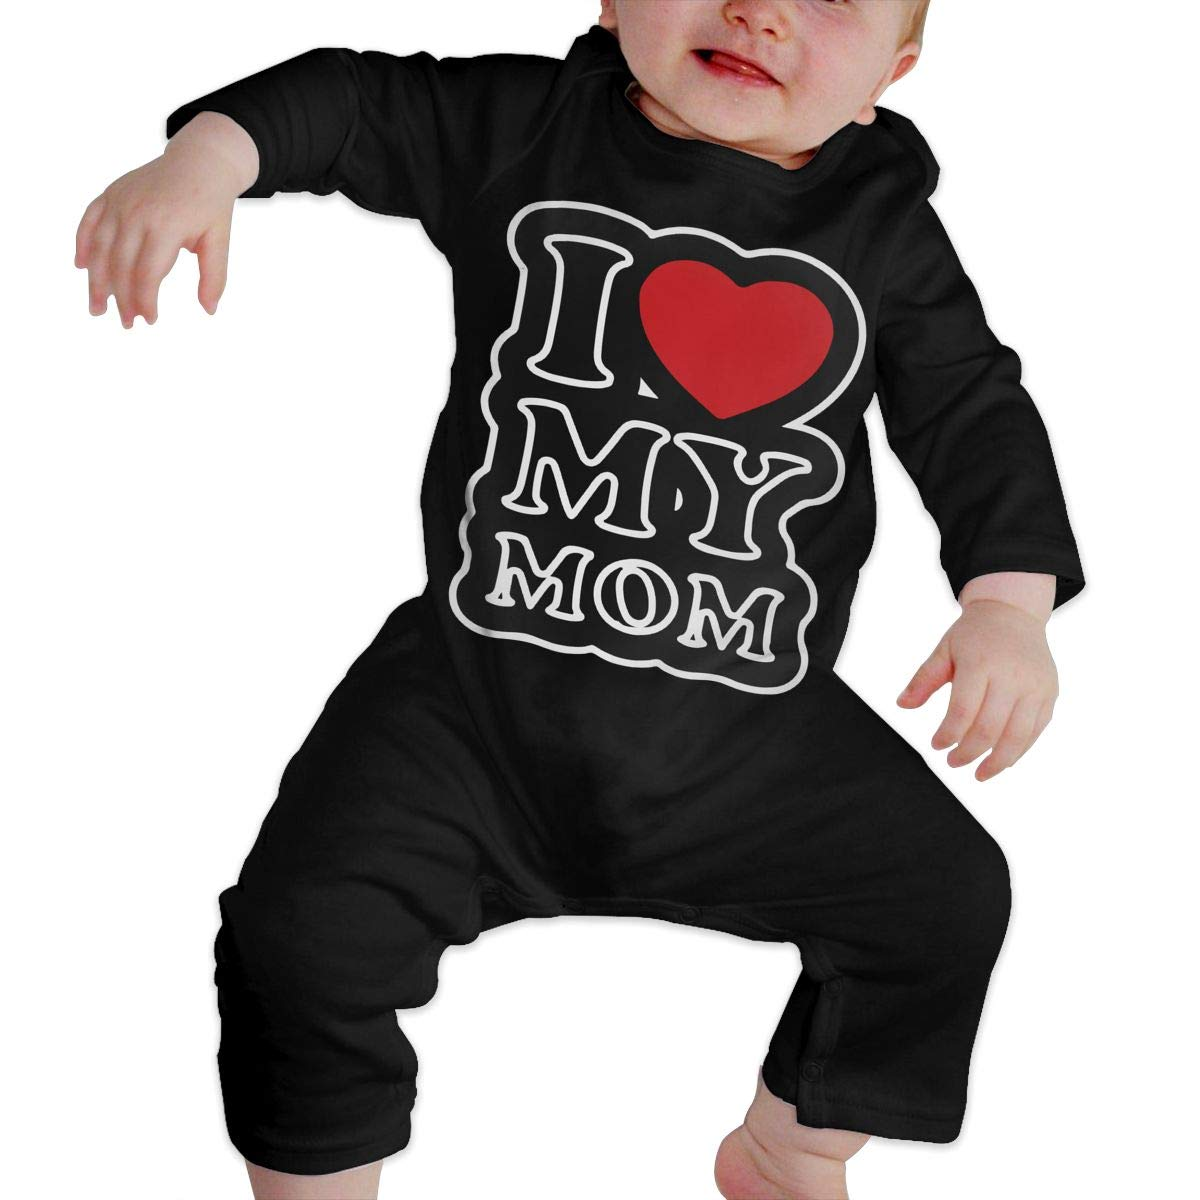 I Love Mom Toddler Baby Long Sleeve Romper Jumpsuit Bodysuits